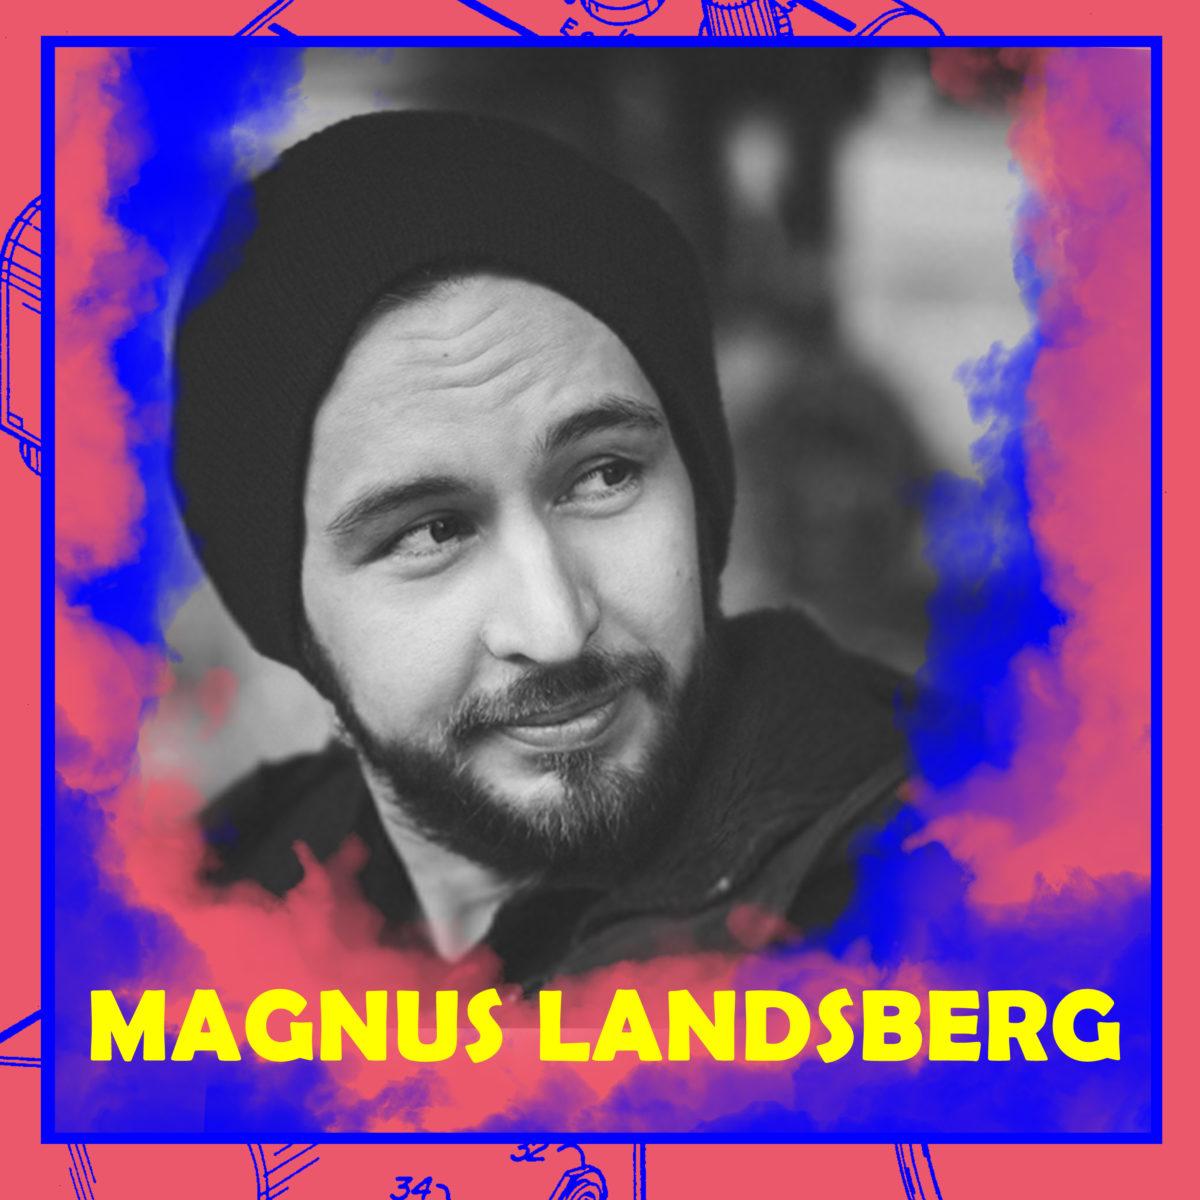 Magnus Landsberg